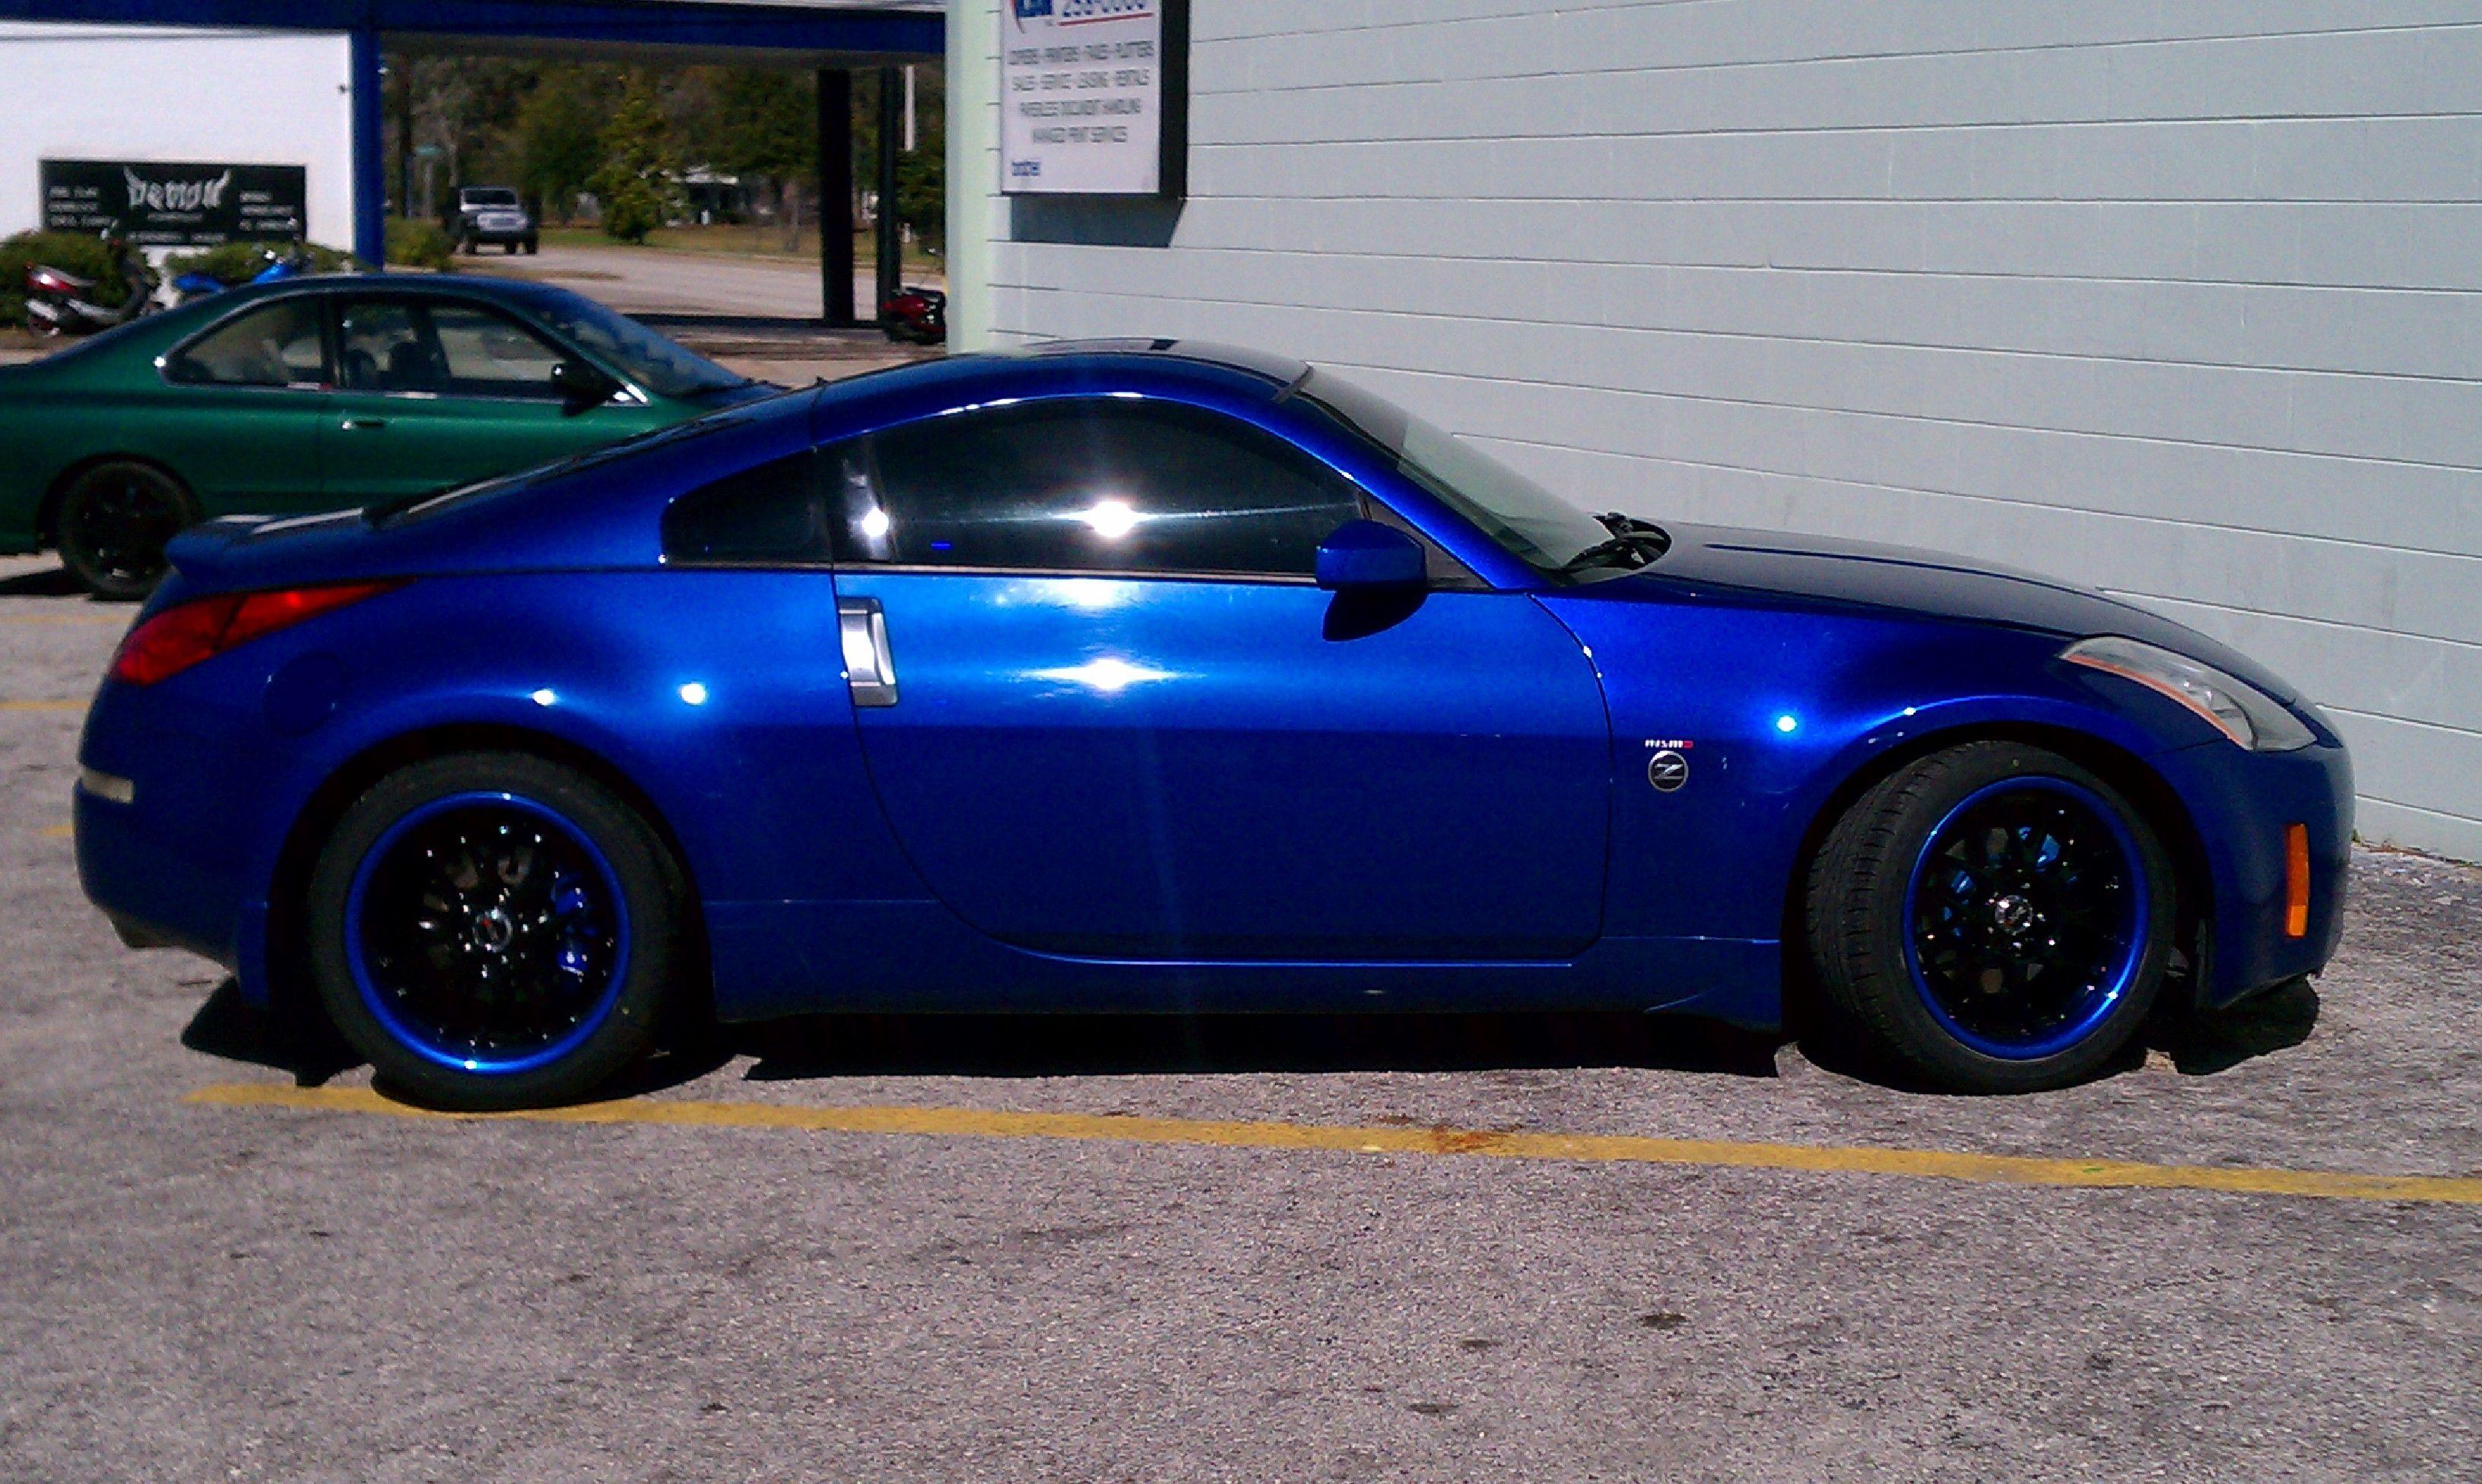 Nissan Columbus Ga >> 350Z on a set of XXR wheels in Black witha blue lip! | Blue lips, Future car, Cool cars